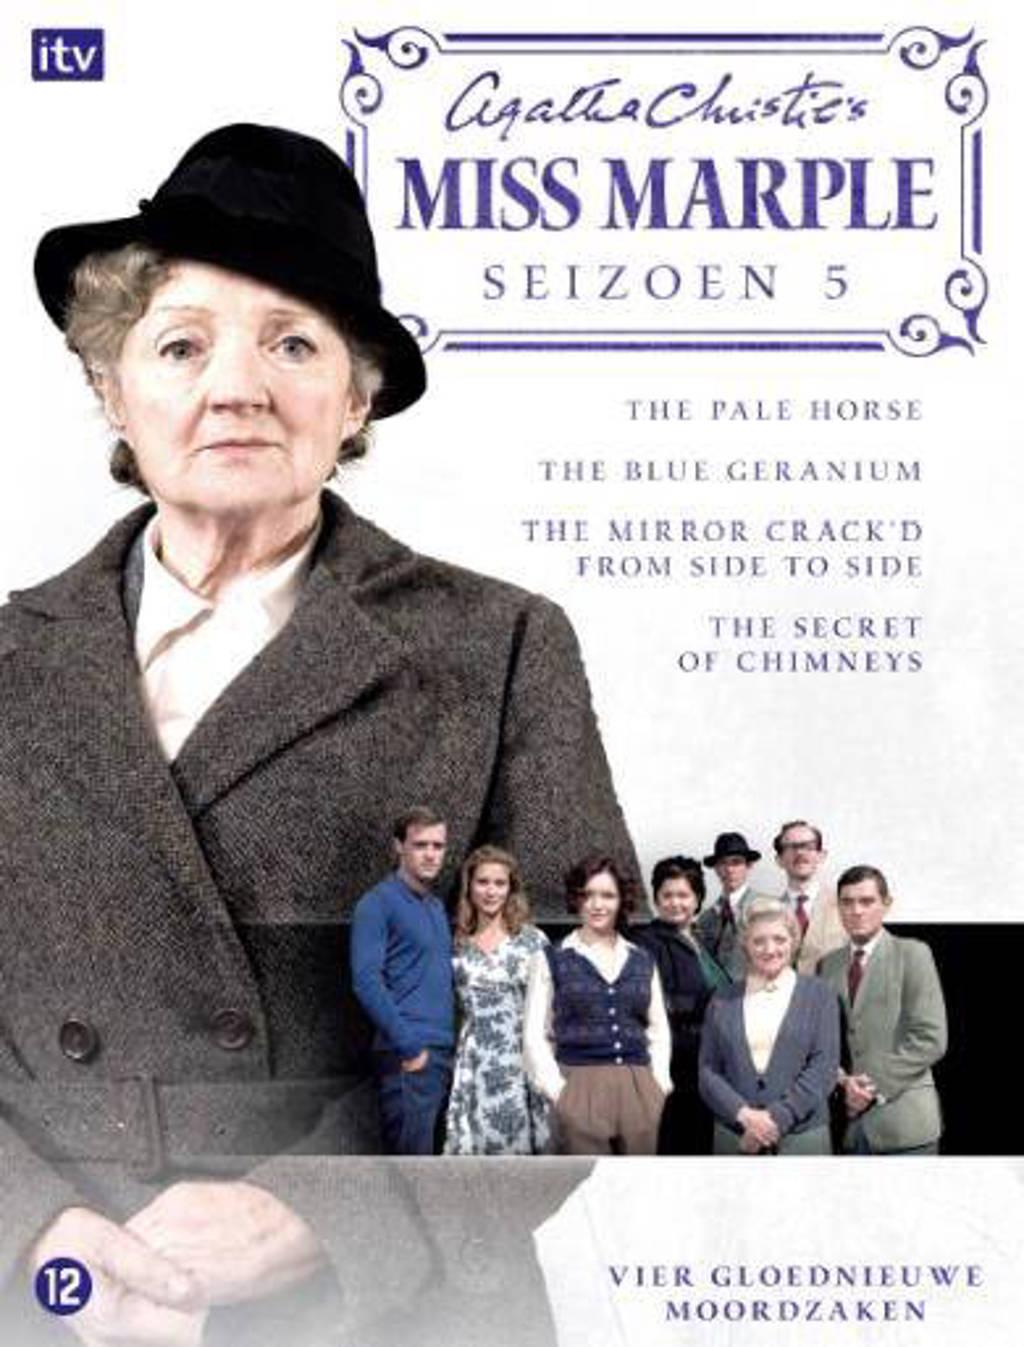 Miss Marple - Seizoen 5 (DVD)